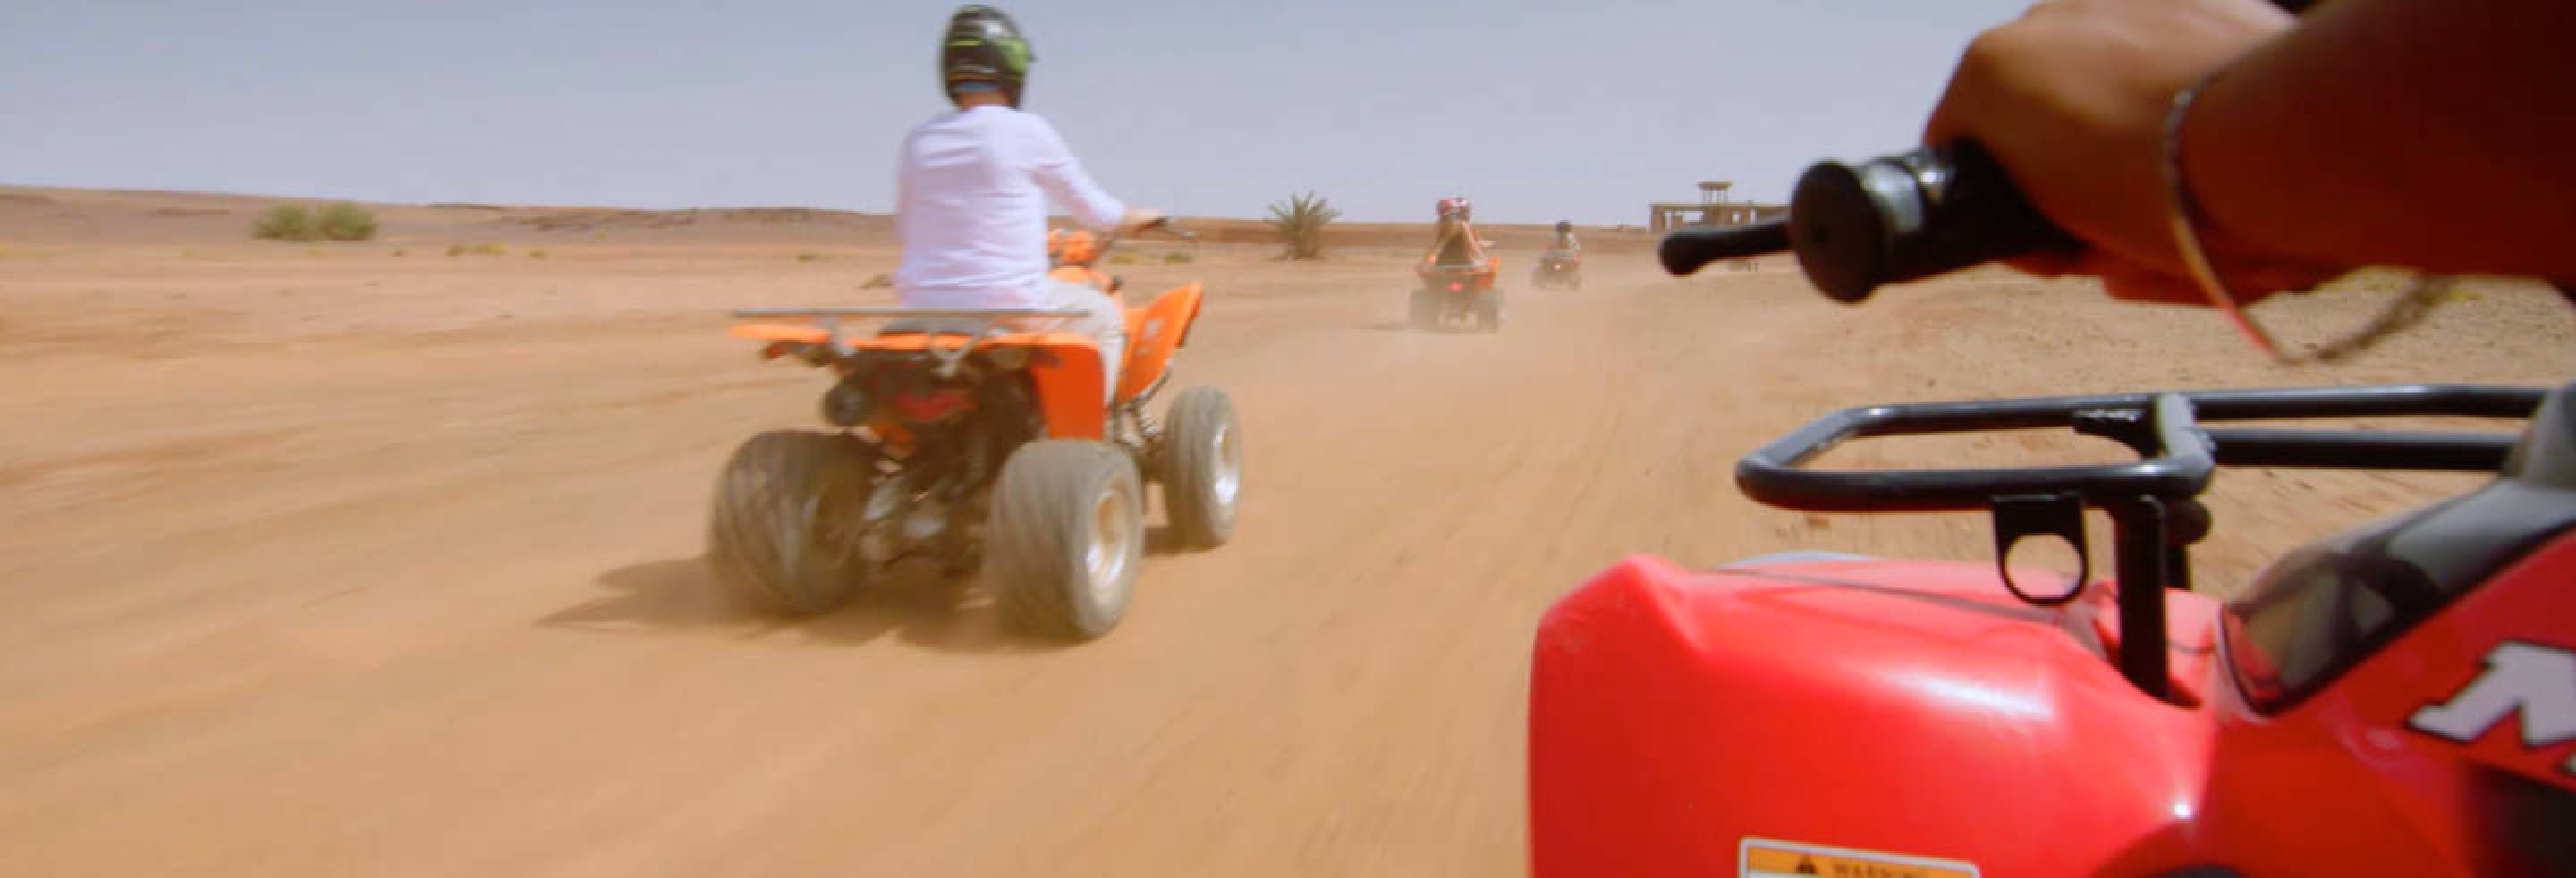 Marrakech Palm Grove Quad Bike Tour